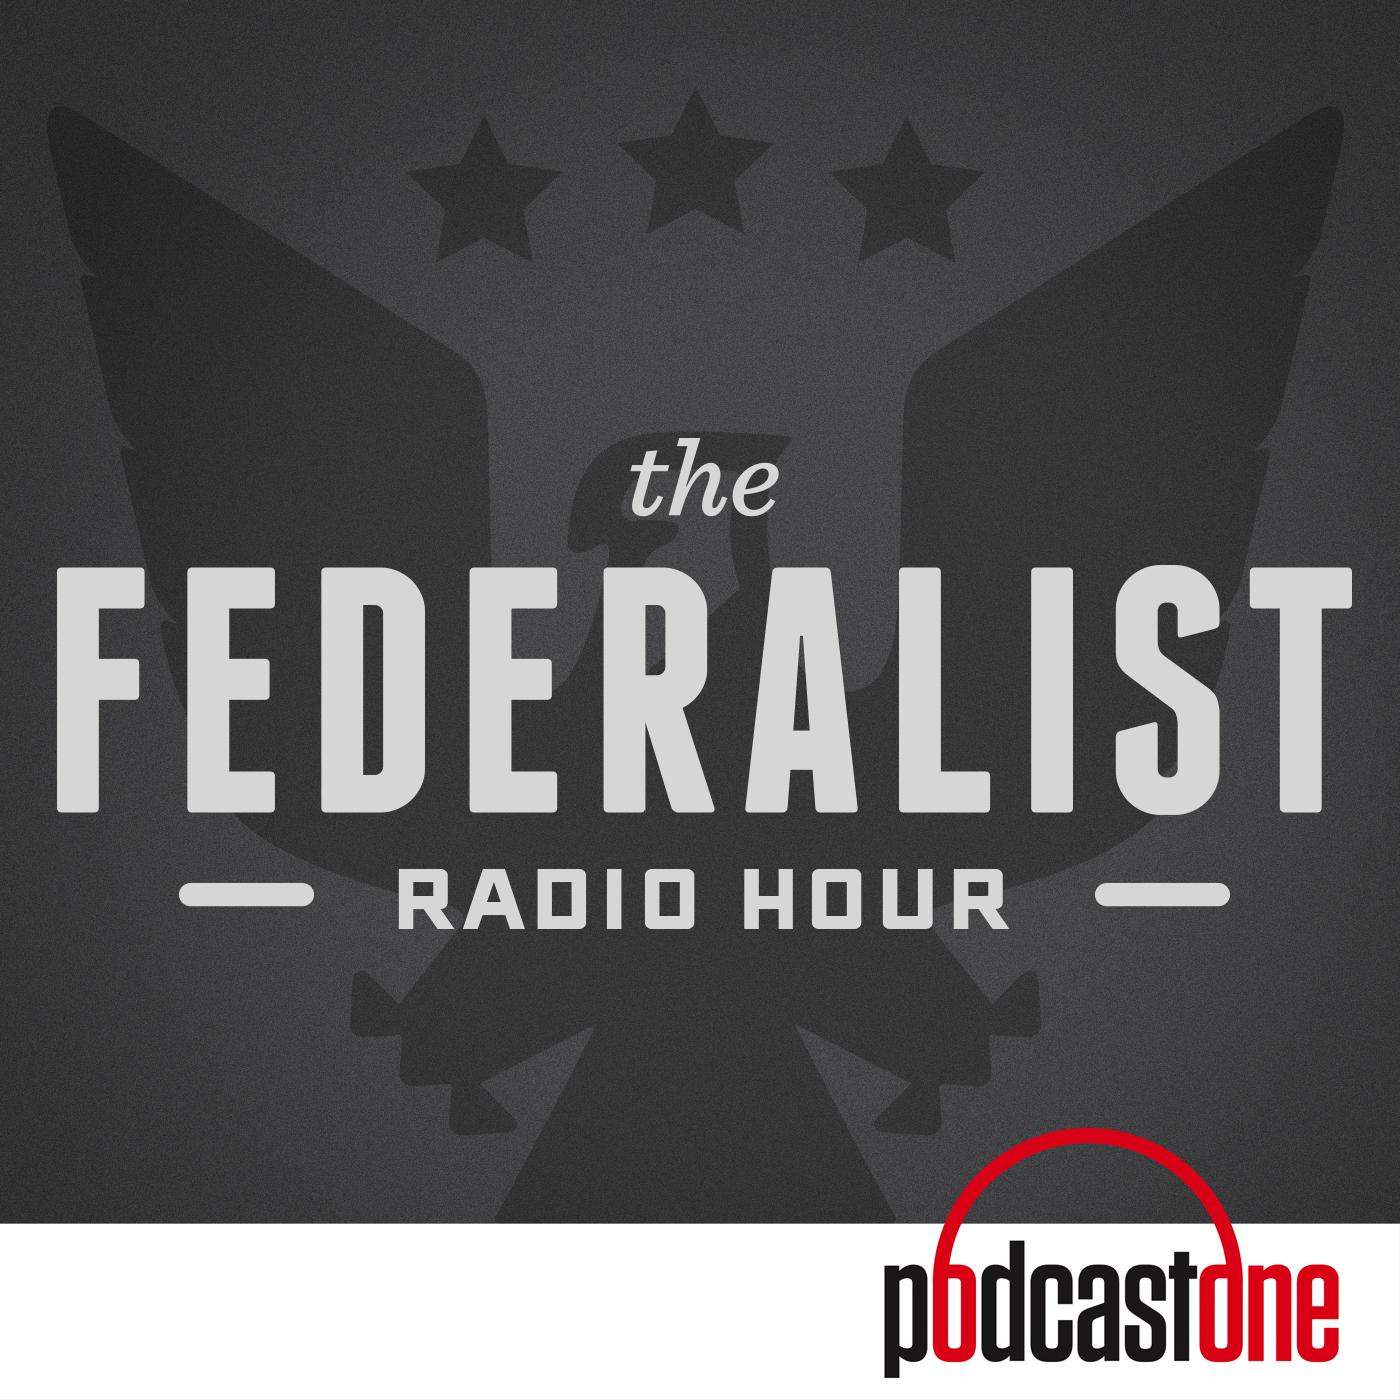 The Federalist Radio Hour